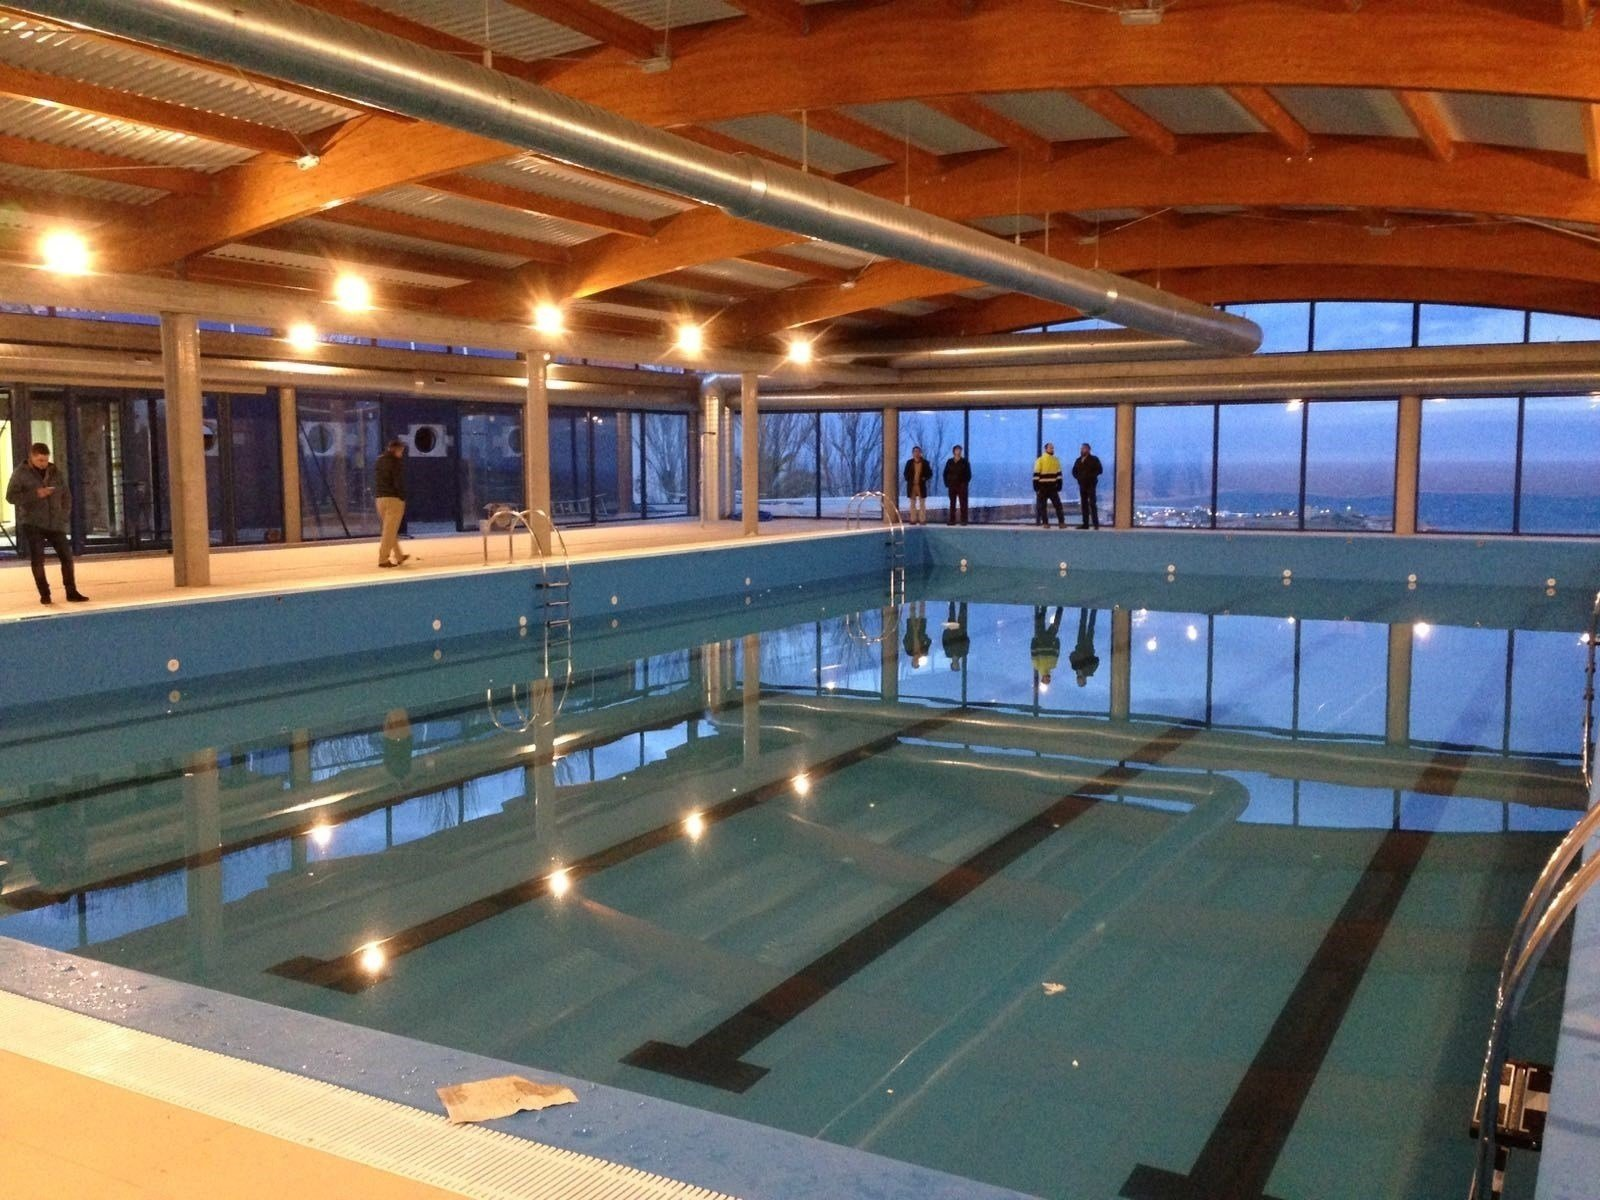 concluida la piscina cubierta tras una inversi n de 700 On piscina cubierta catarroja